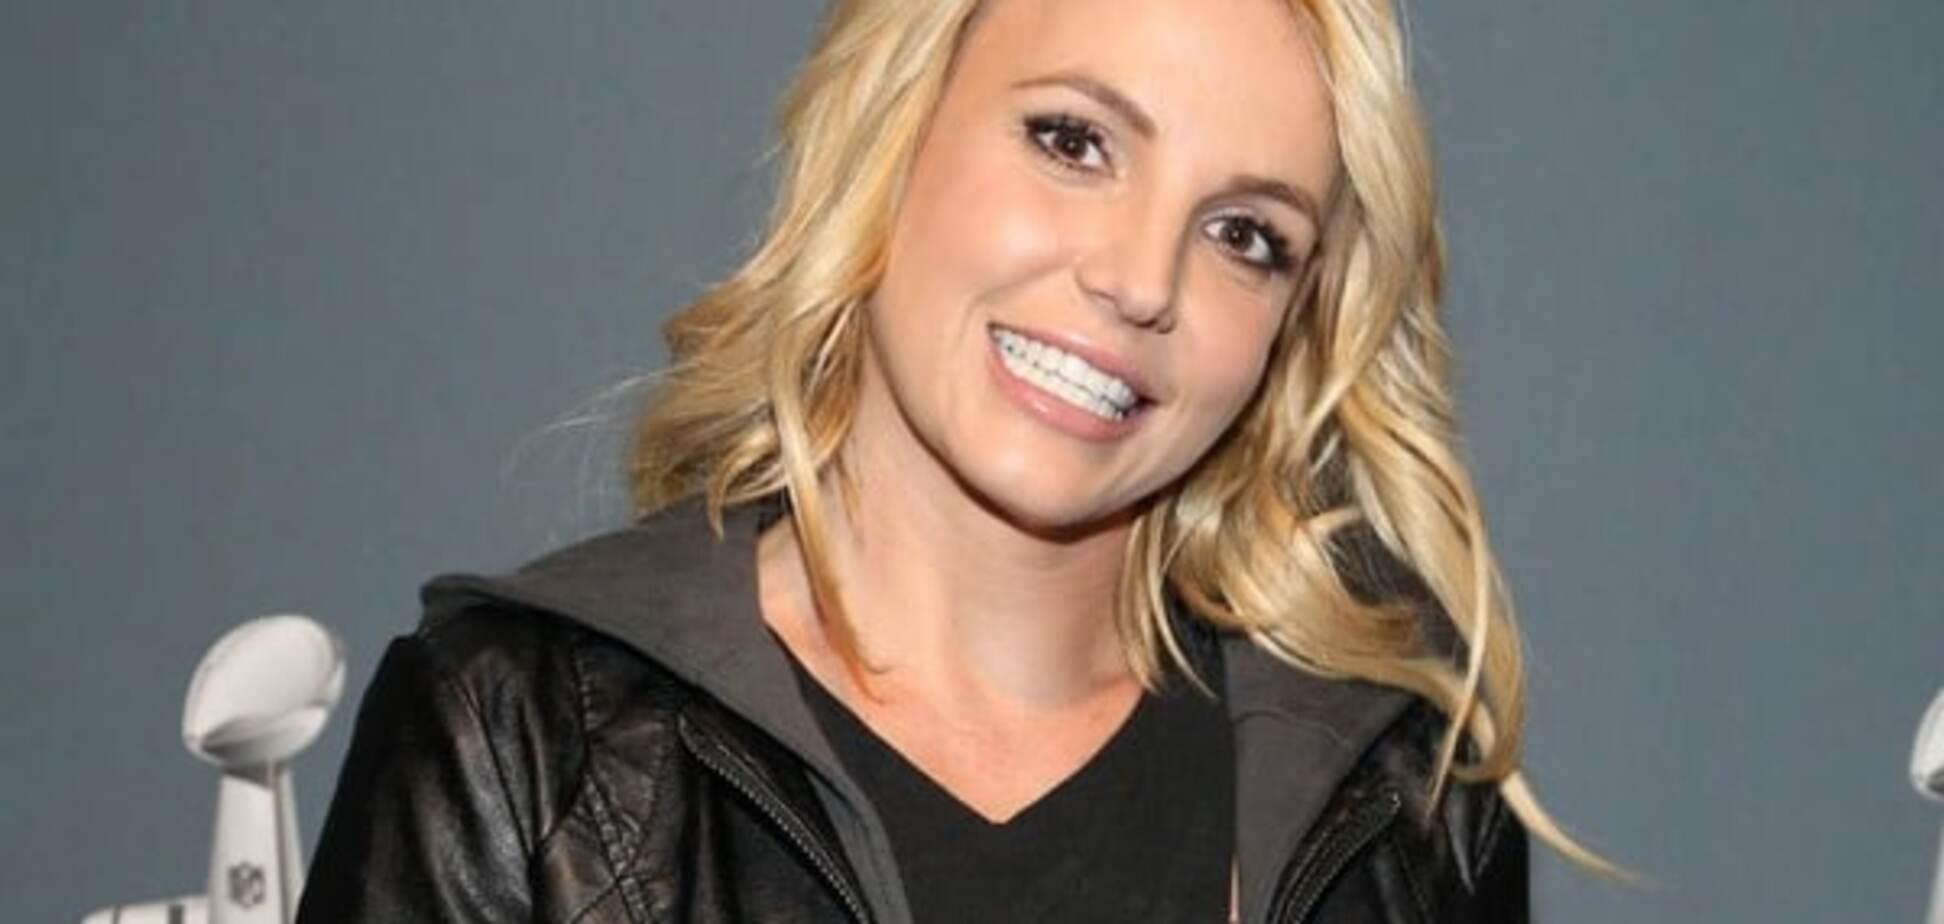 Бритни Спирс попала в плен на собственном концерте: видеофакт